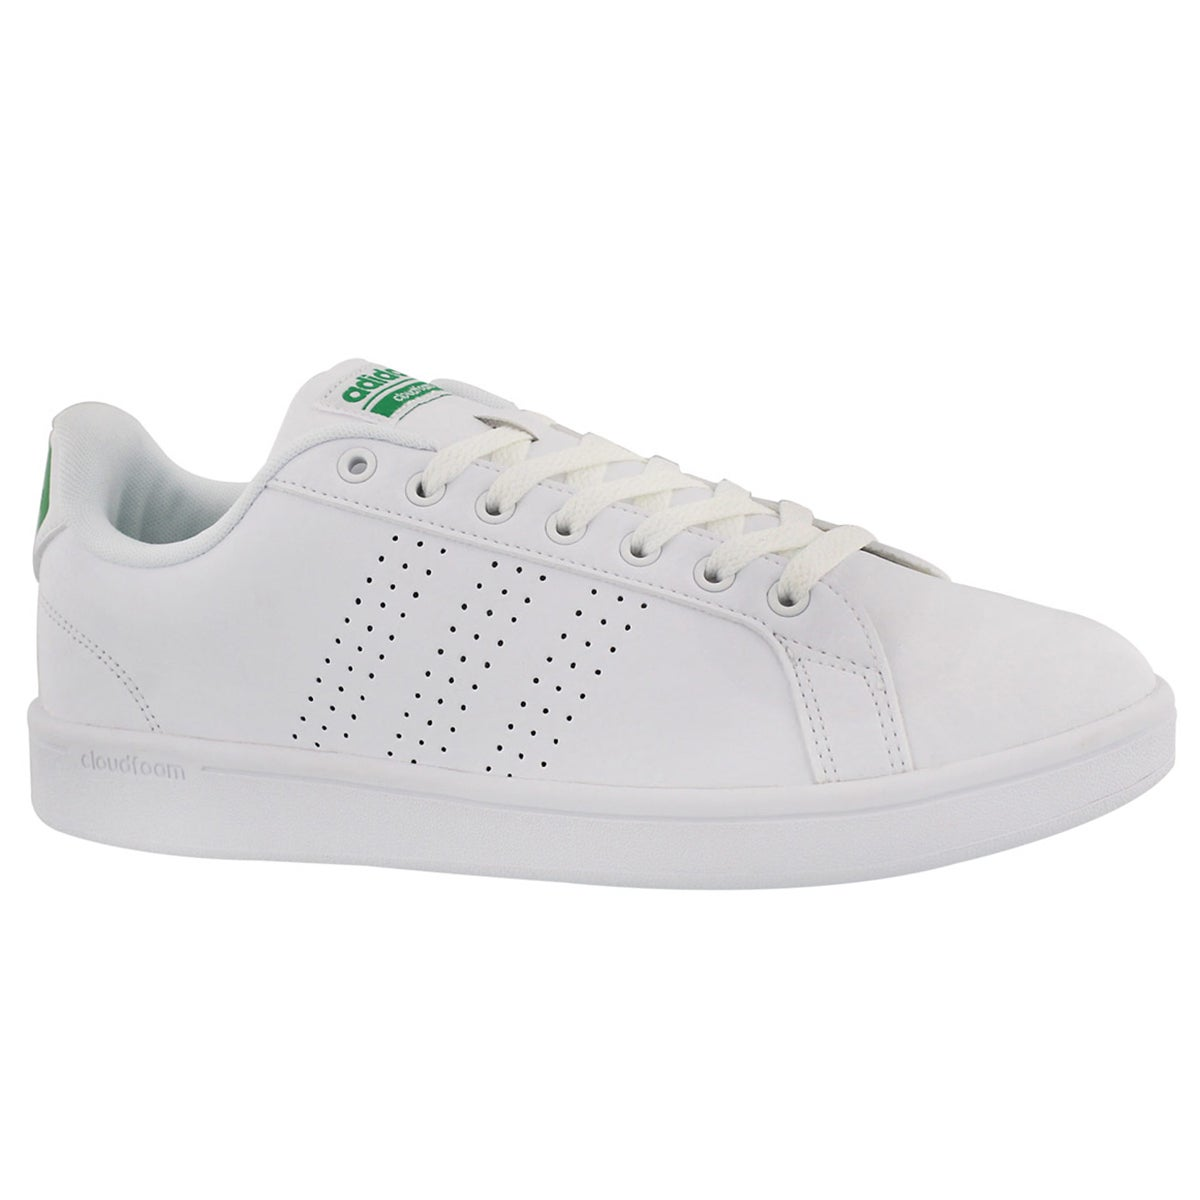 Men's CLOUDFOAM ADVANTAGE CLEAN wht/grn sneakers